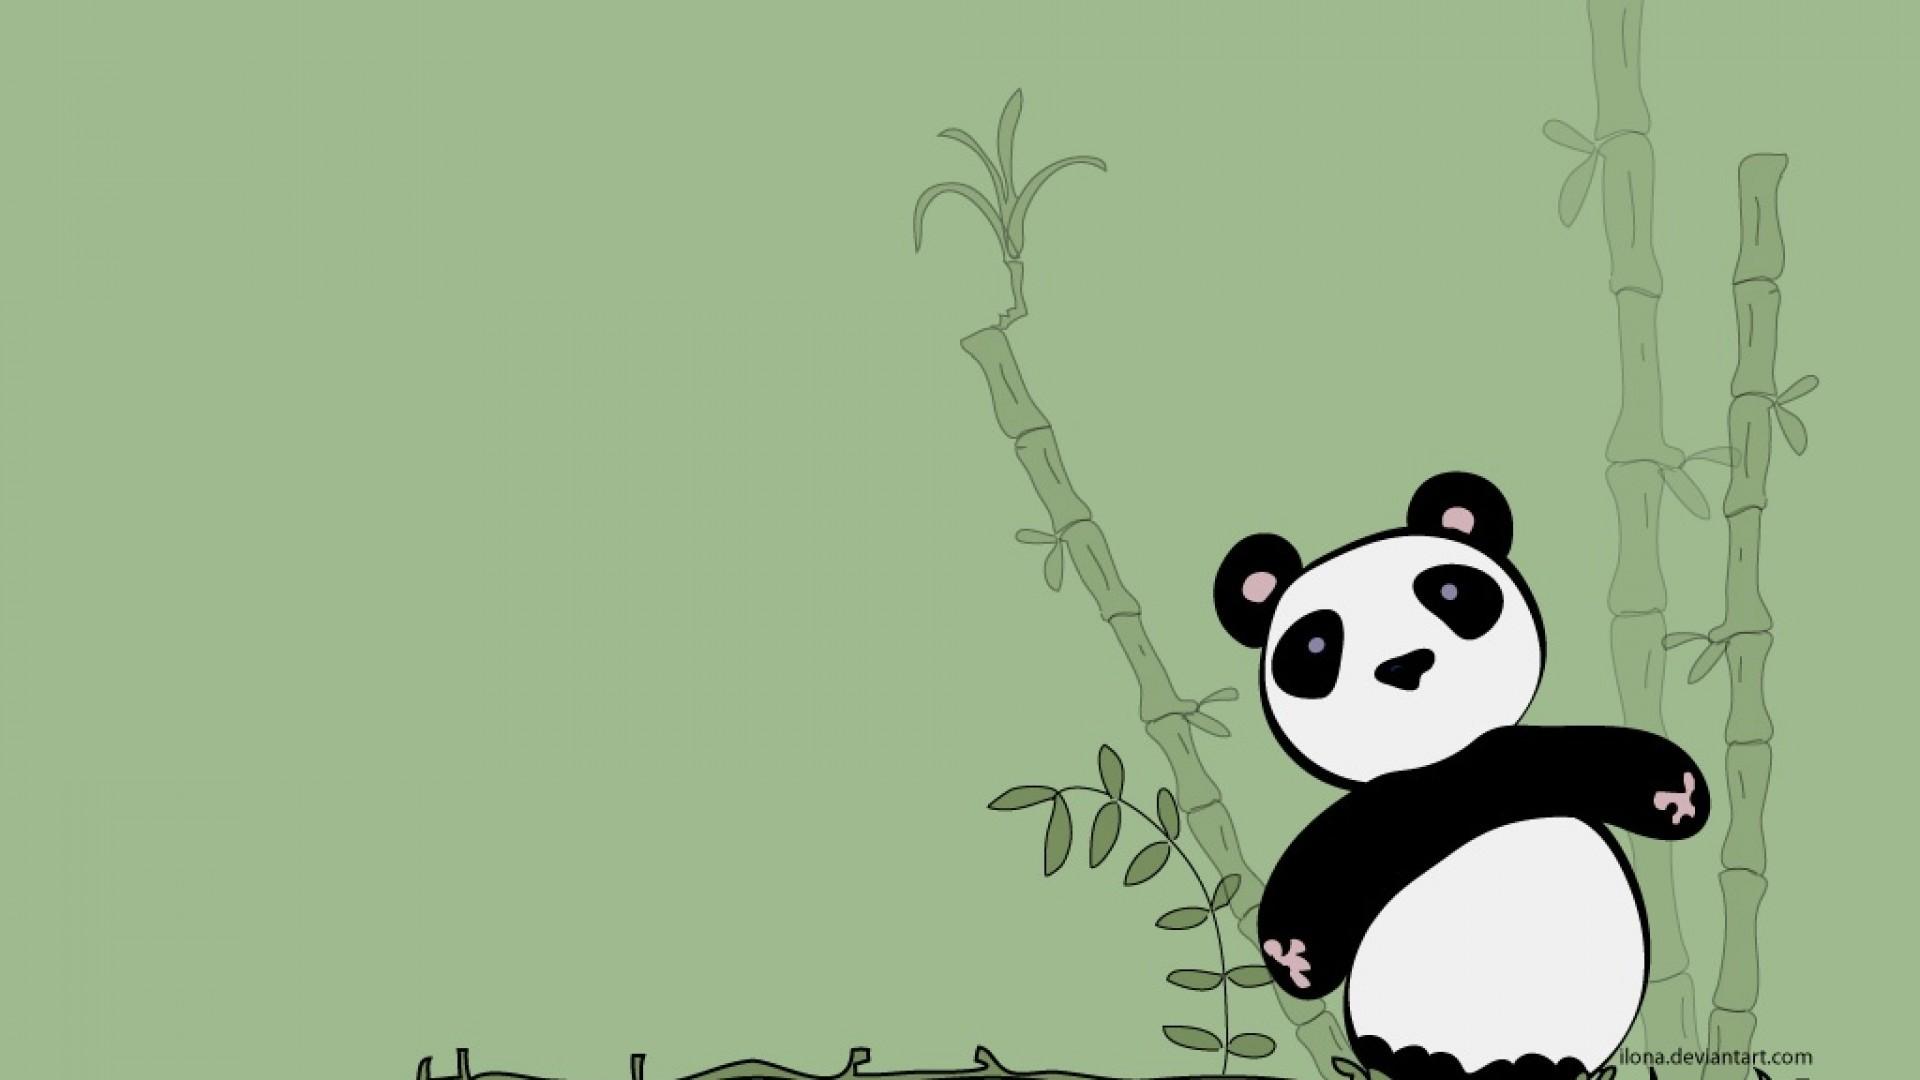 Cute Panda Background wallpaper